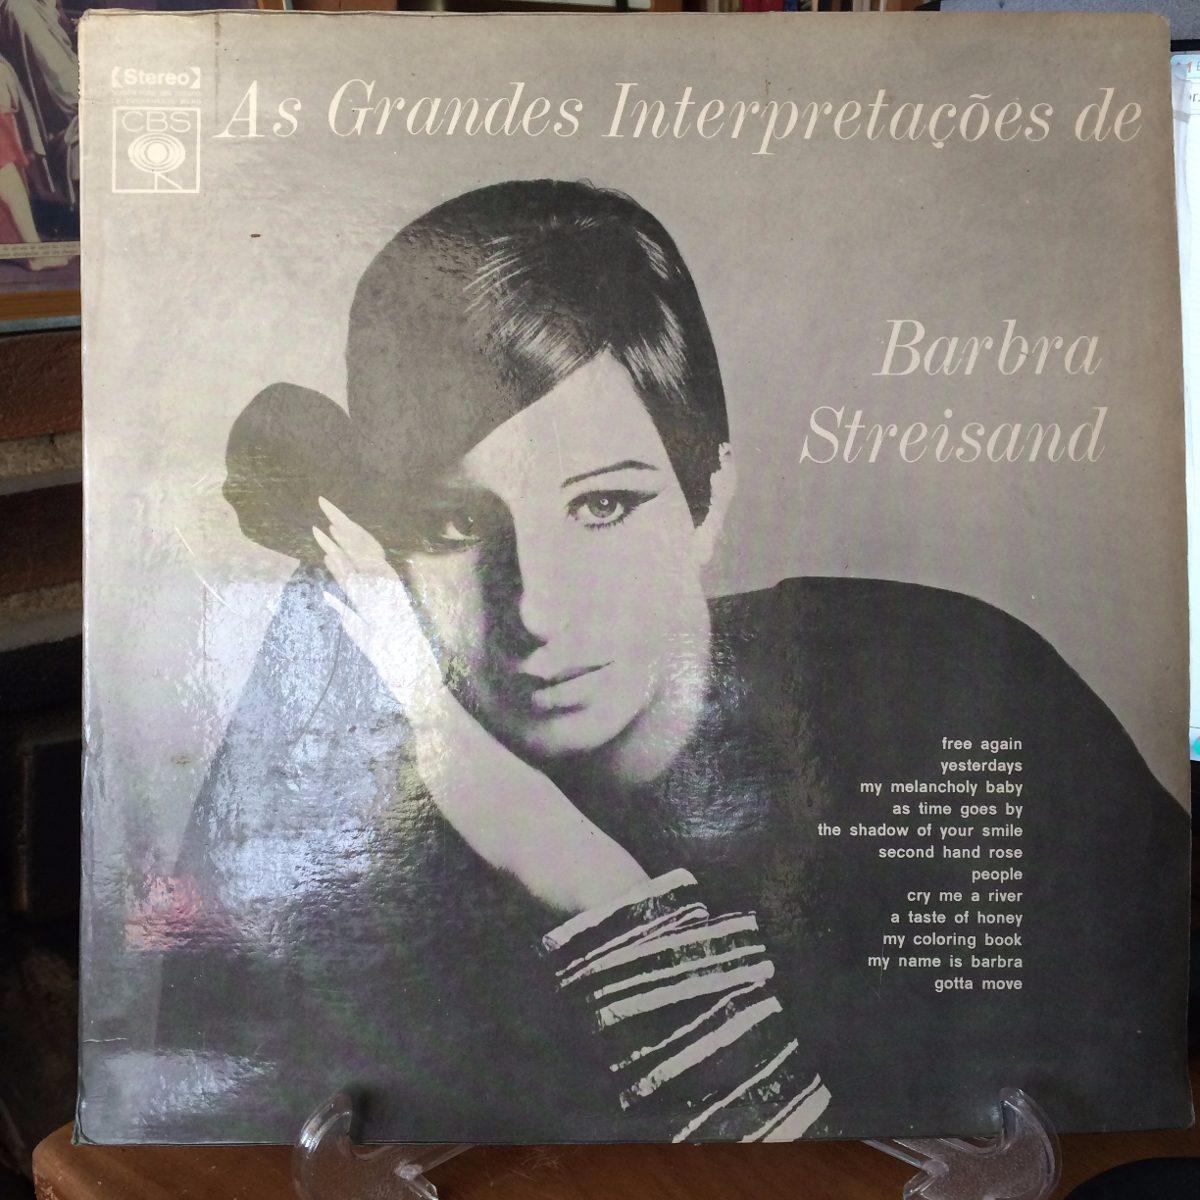 The coloring book barbra streisand - Lp As Grandes Interpreta Es De Barbra Streisand